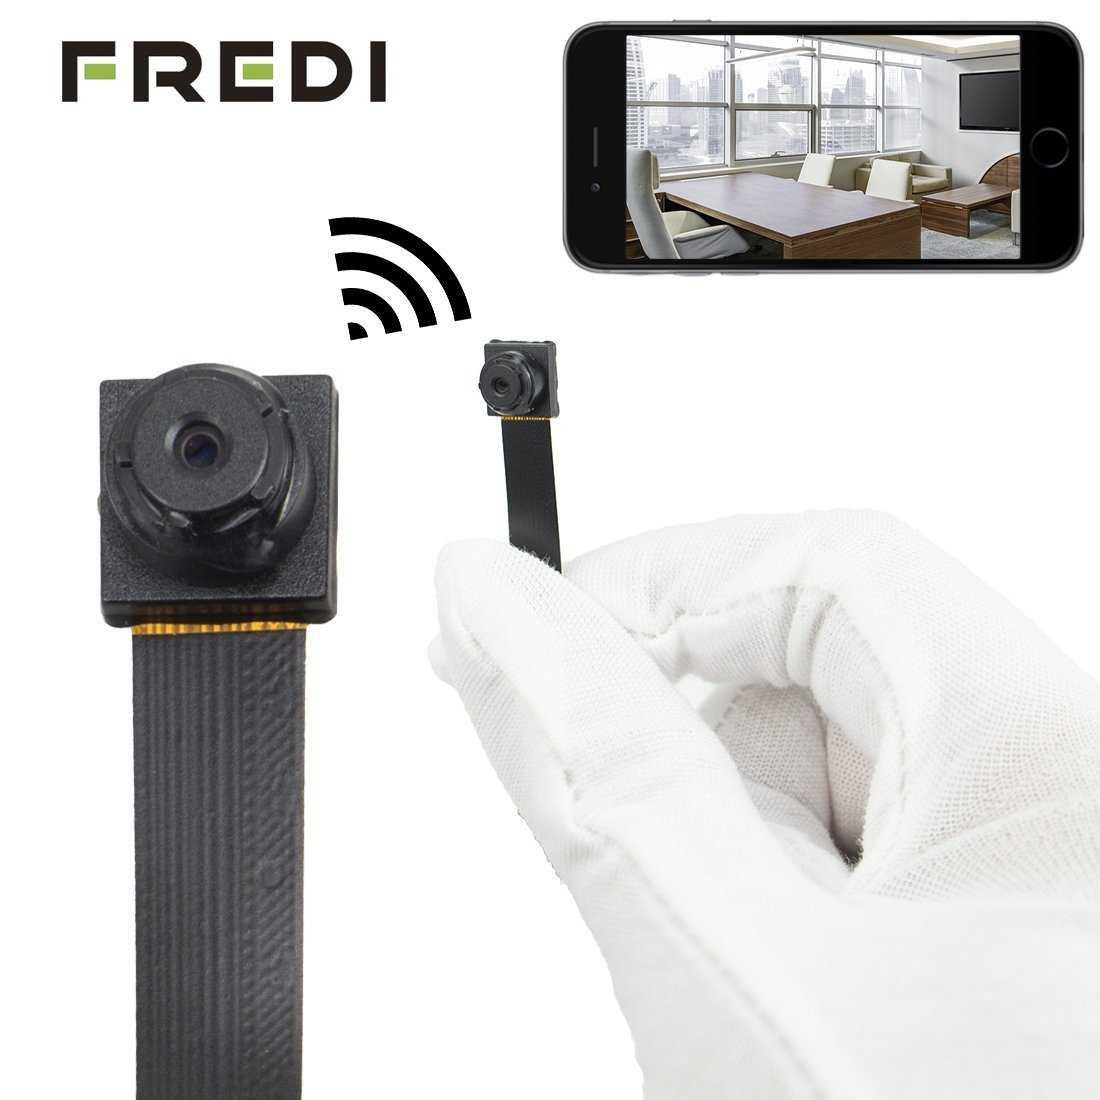 Hidden camera hd recording-4167